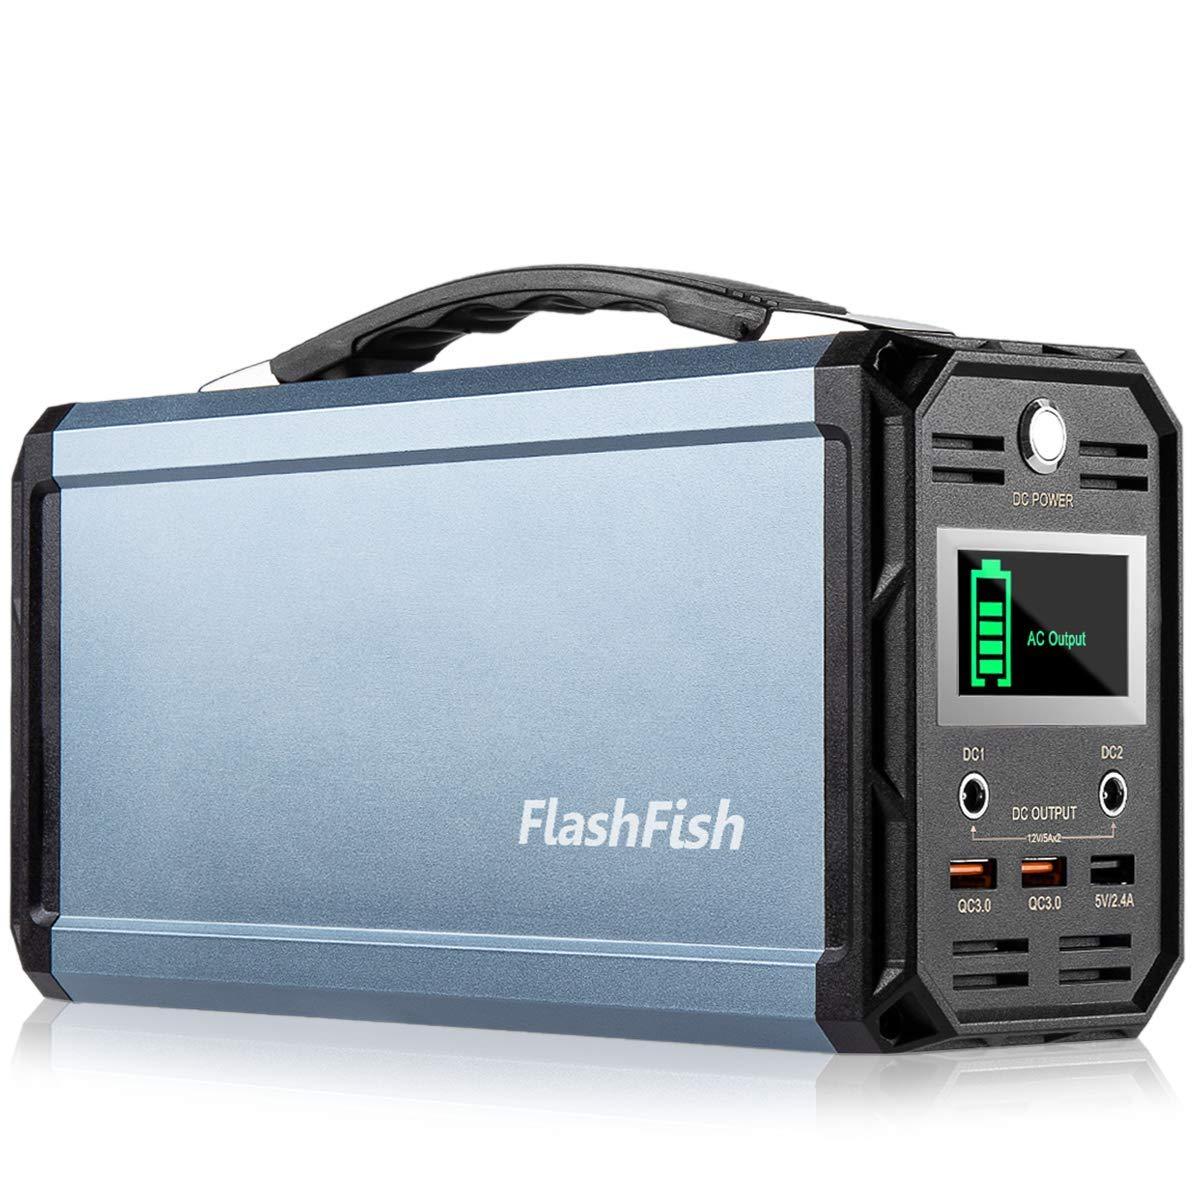 Portable Generator FlashFish 60000mAh Recharged